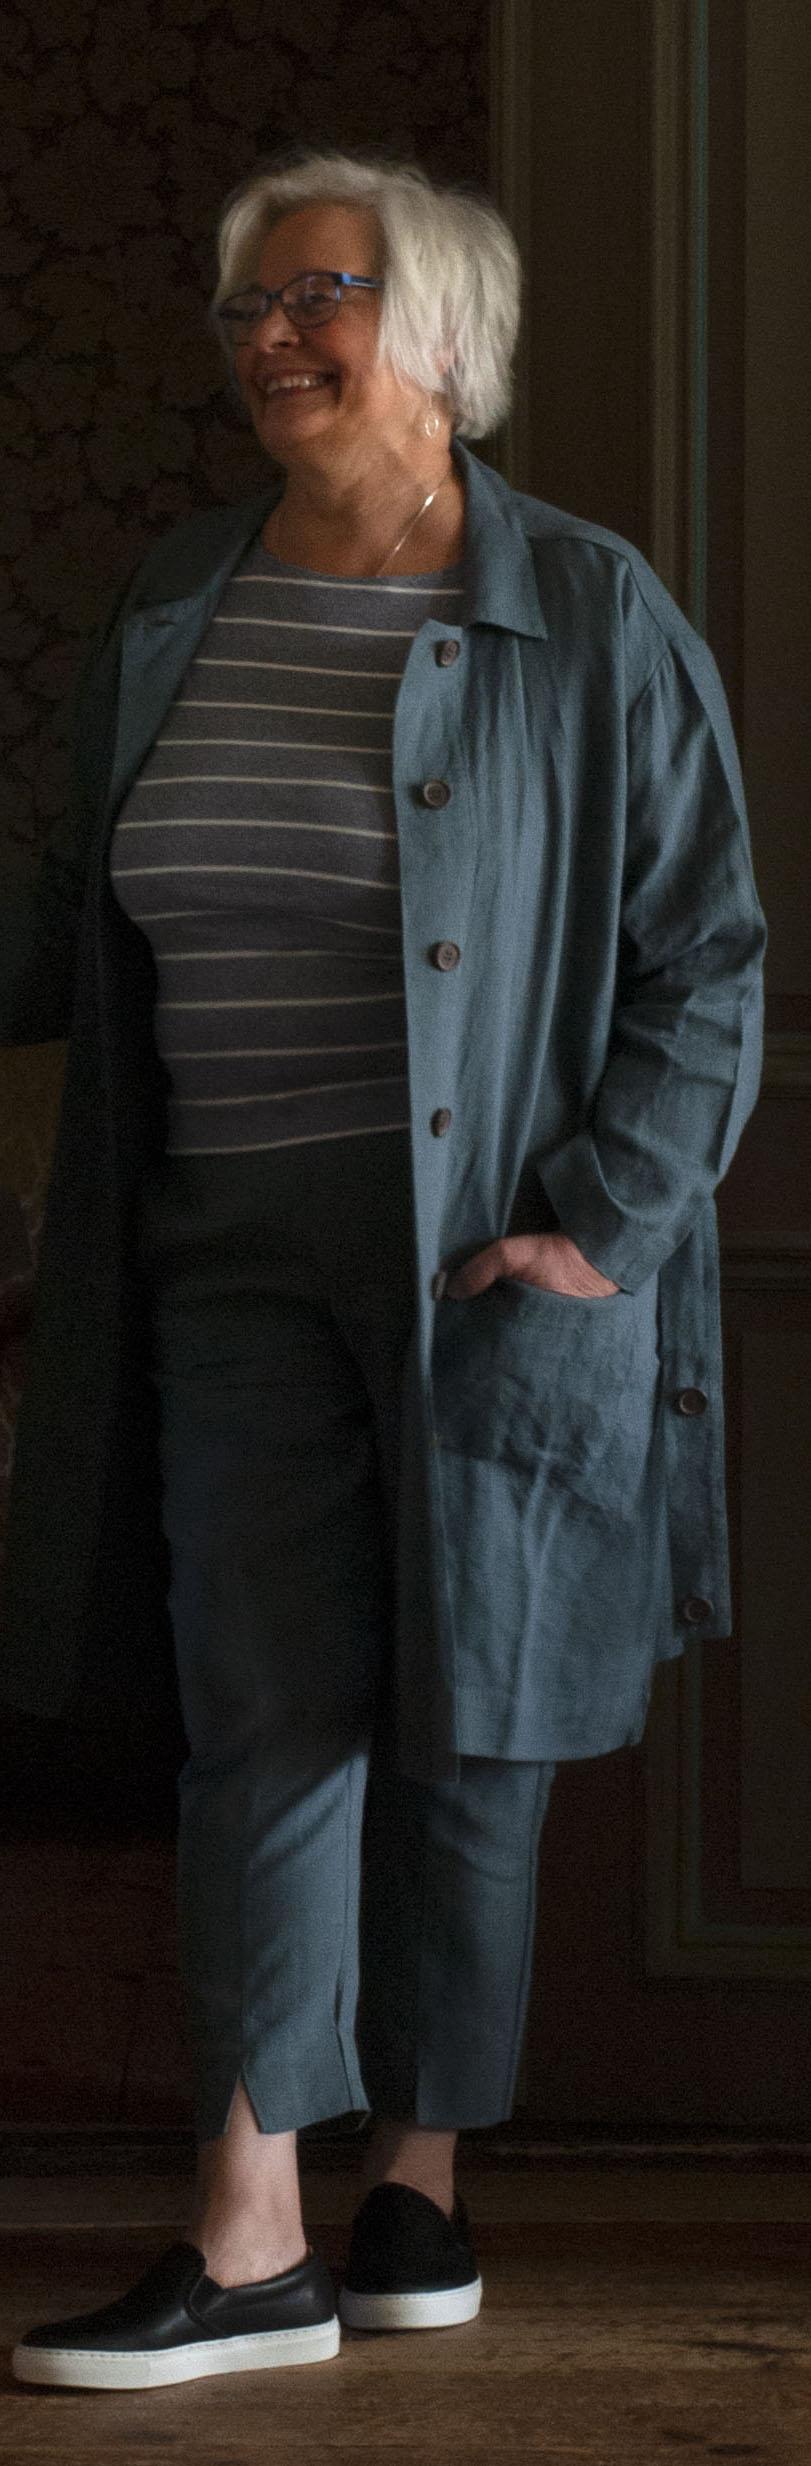 Jack lång i linne